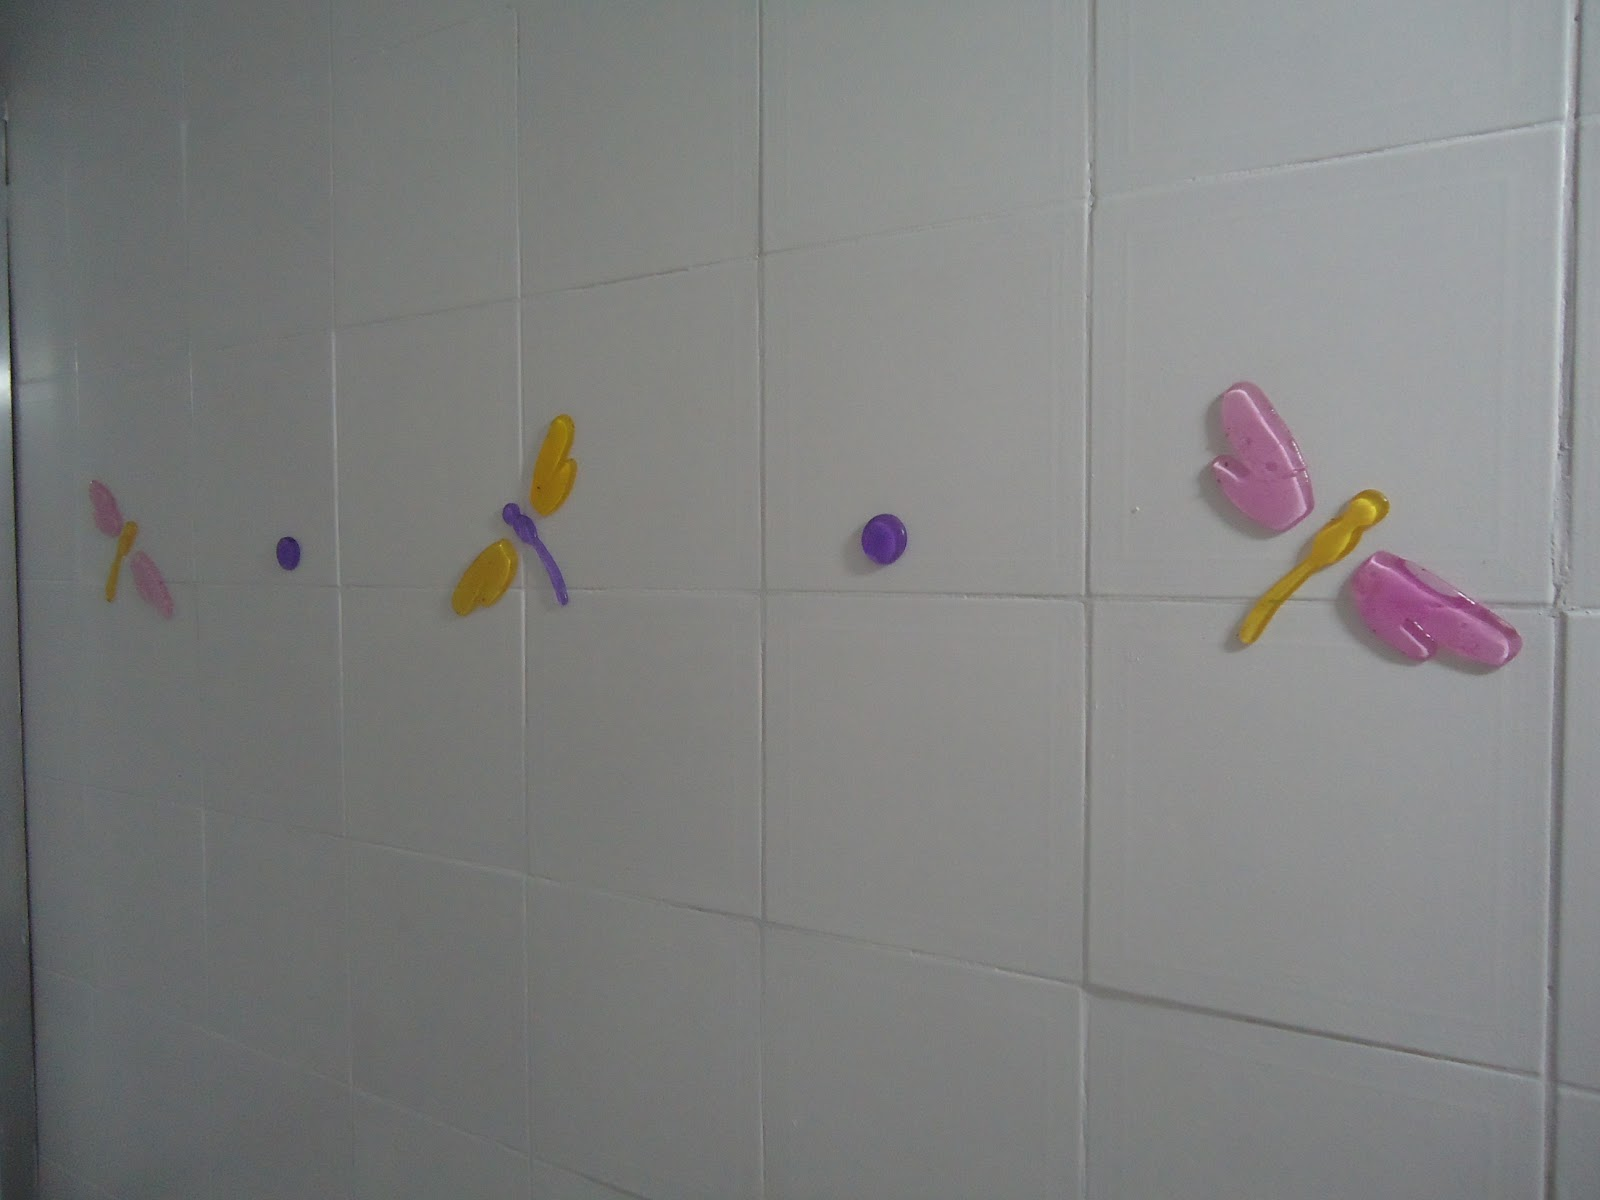 Ah! Esqueci de comentar que o azulejo era na cor bege assim só  #856B27 1600x1200 Banheiro Azulejo Pintado